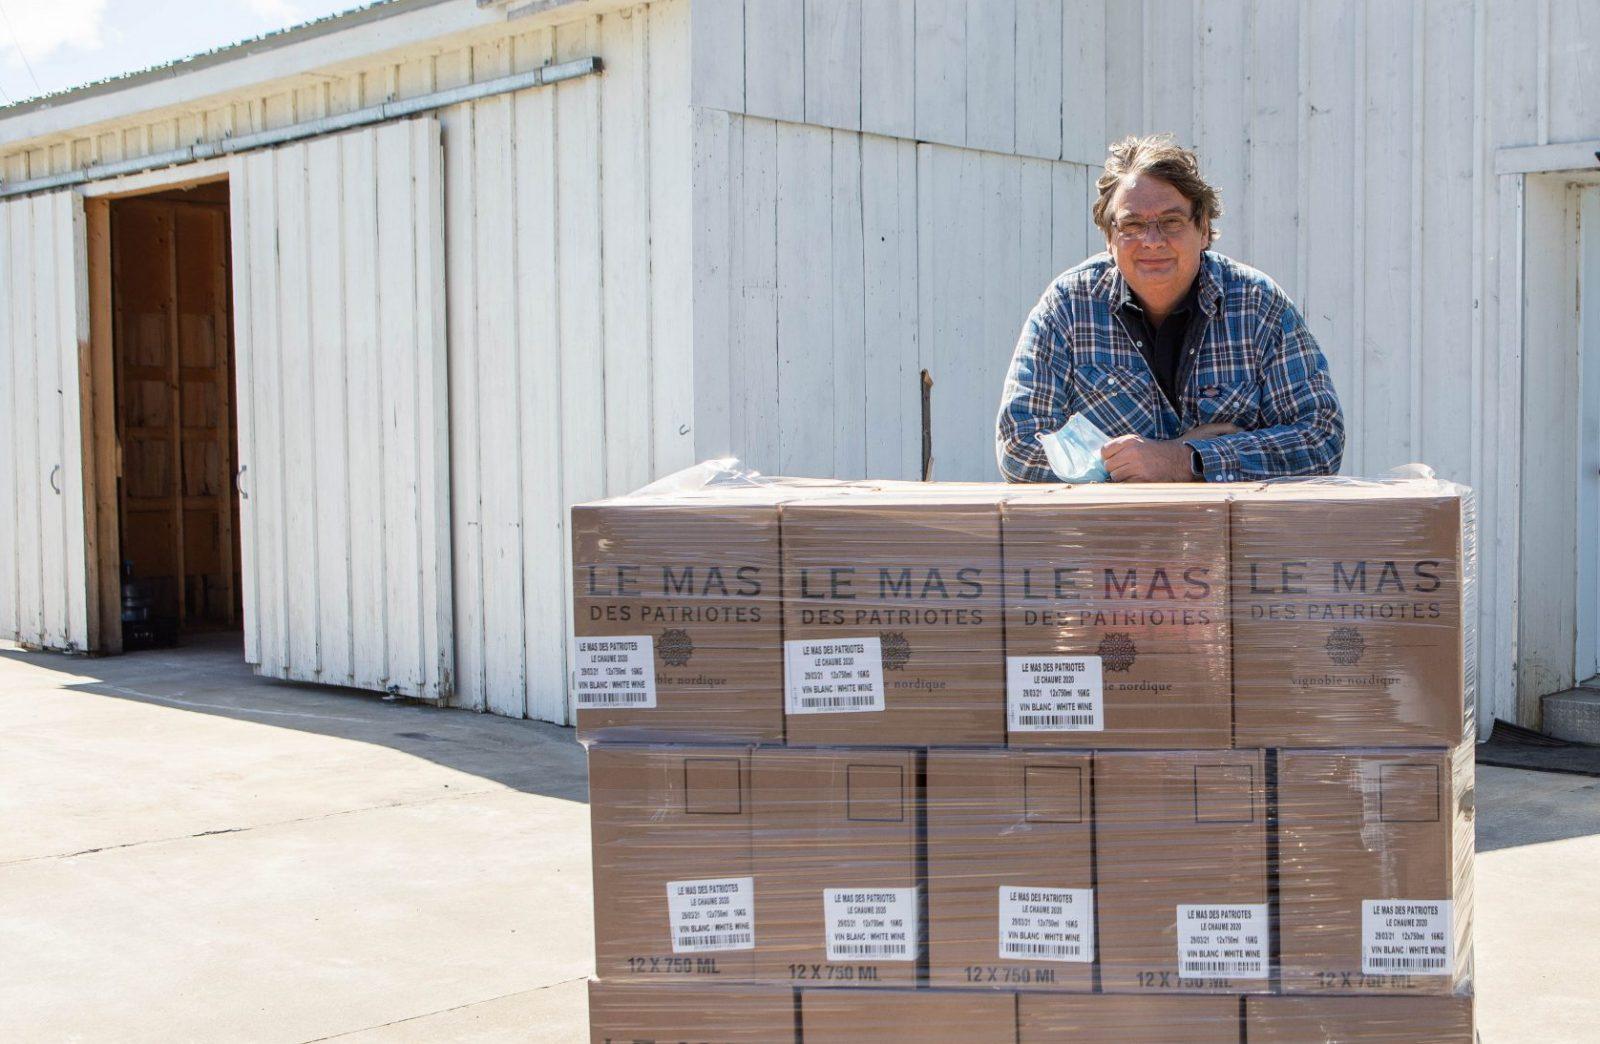 Les ventes de vins du Québec en hausse de 18% en un an